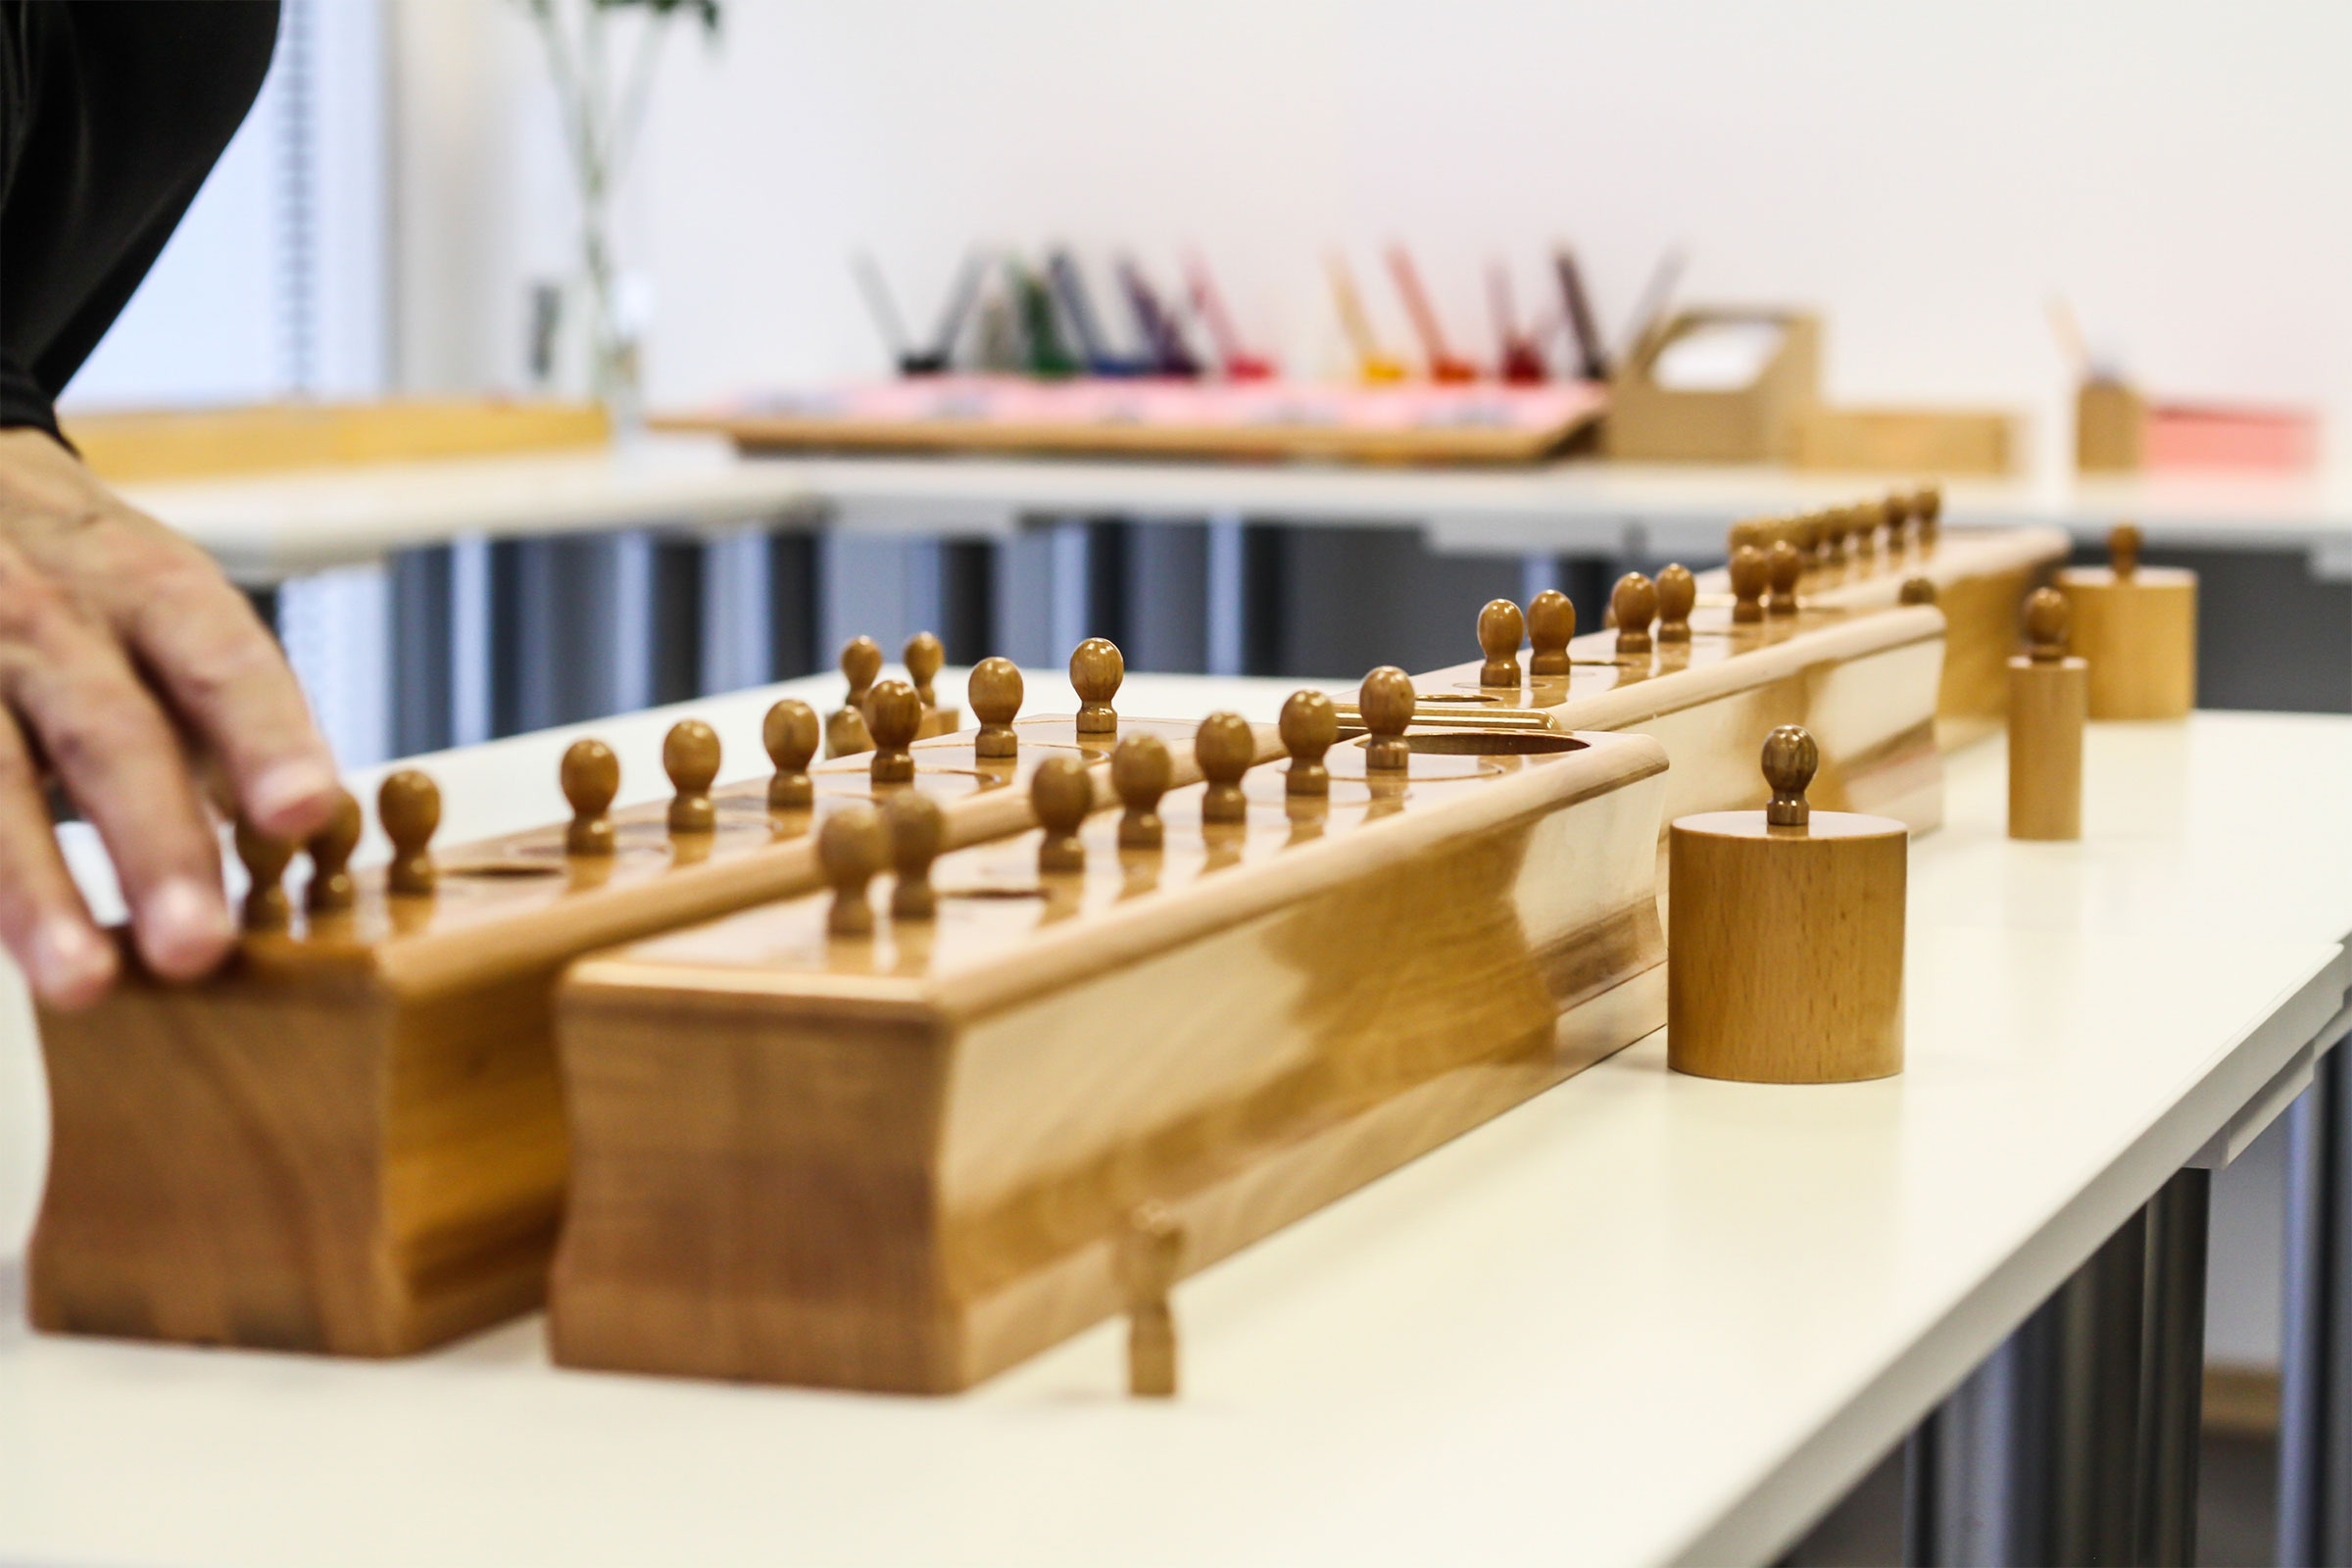 Montessori materials - cylinder blocks